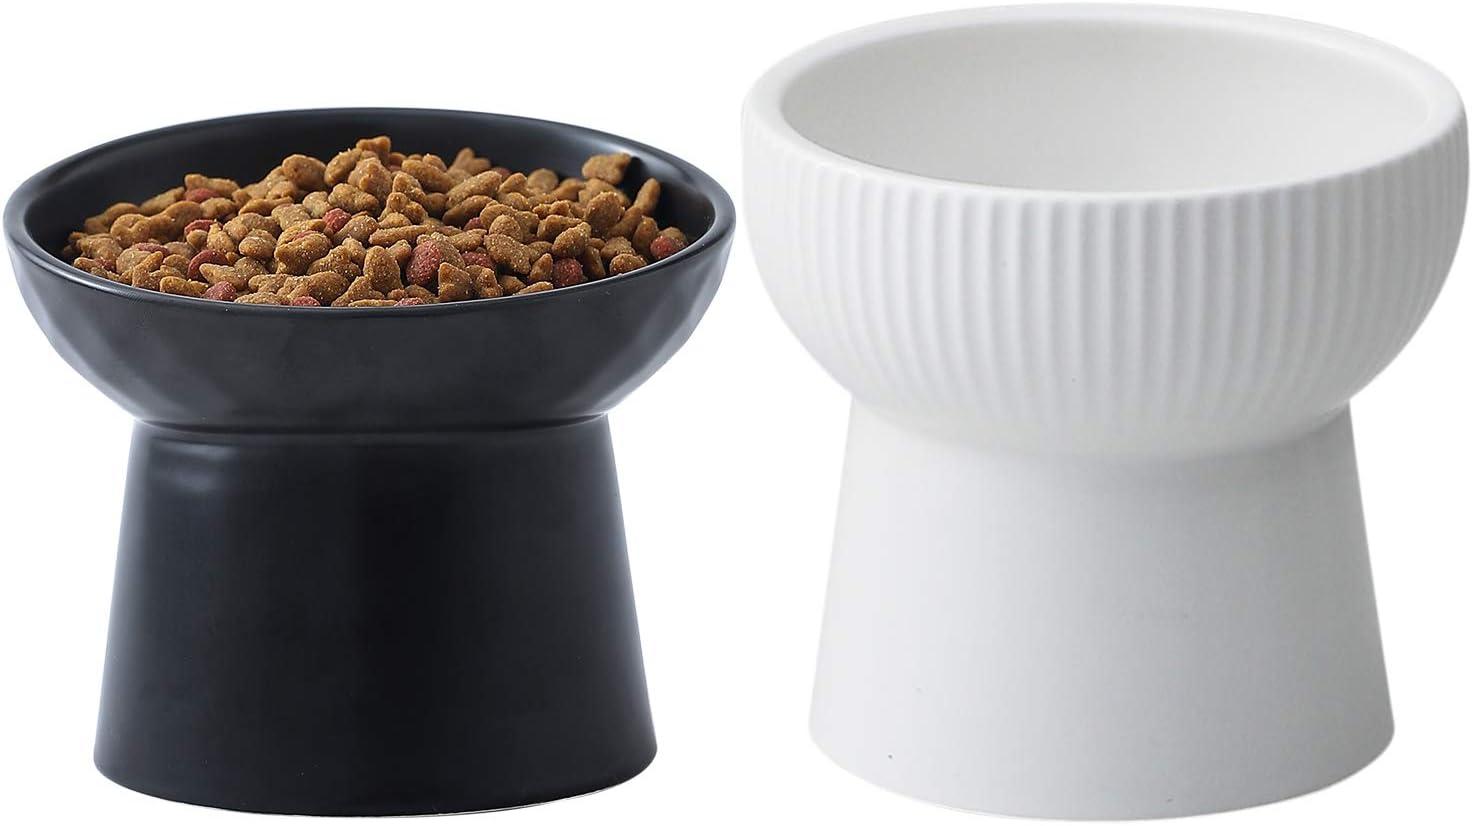 OMAYKEY 15 OZ White Raised Ceramic Cat Pet Food Bowls, Porcelain Tilted Elevated Black Pet Water Bowl Set, Elevated Stress Free Backflow Cat Bowl Dish, Dishwasher and Microwave Safe, 2 Pack